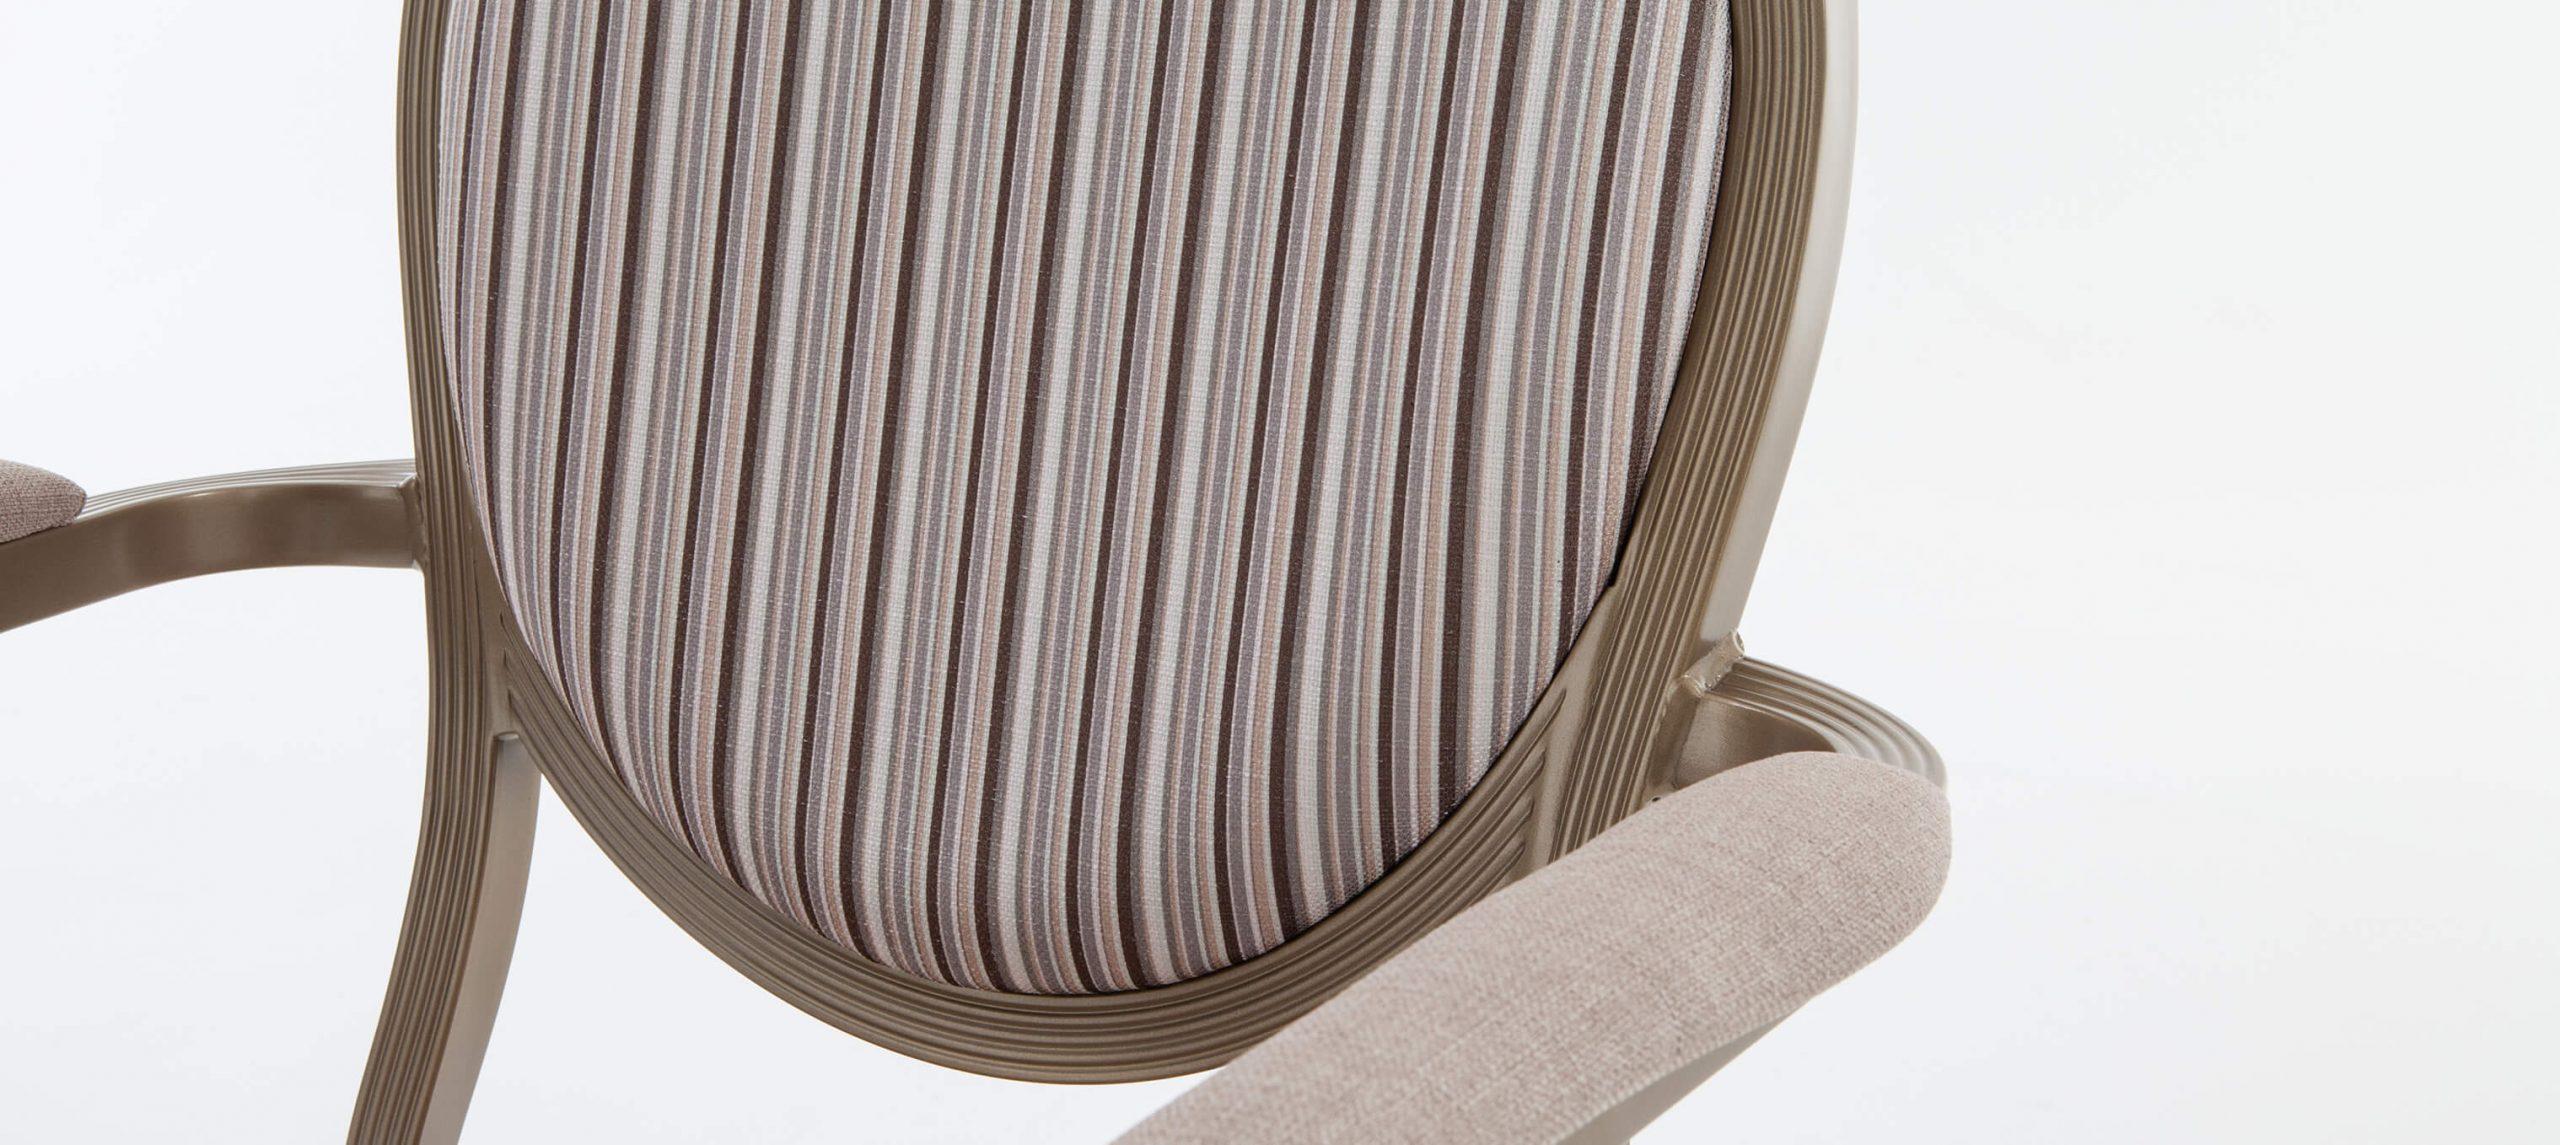 Salon Chair - Close Up  1500x1671